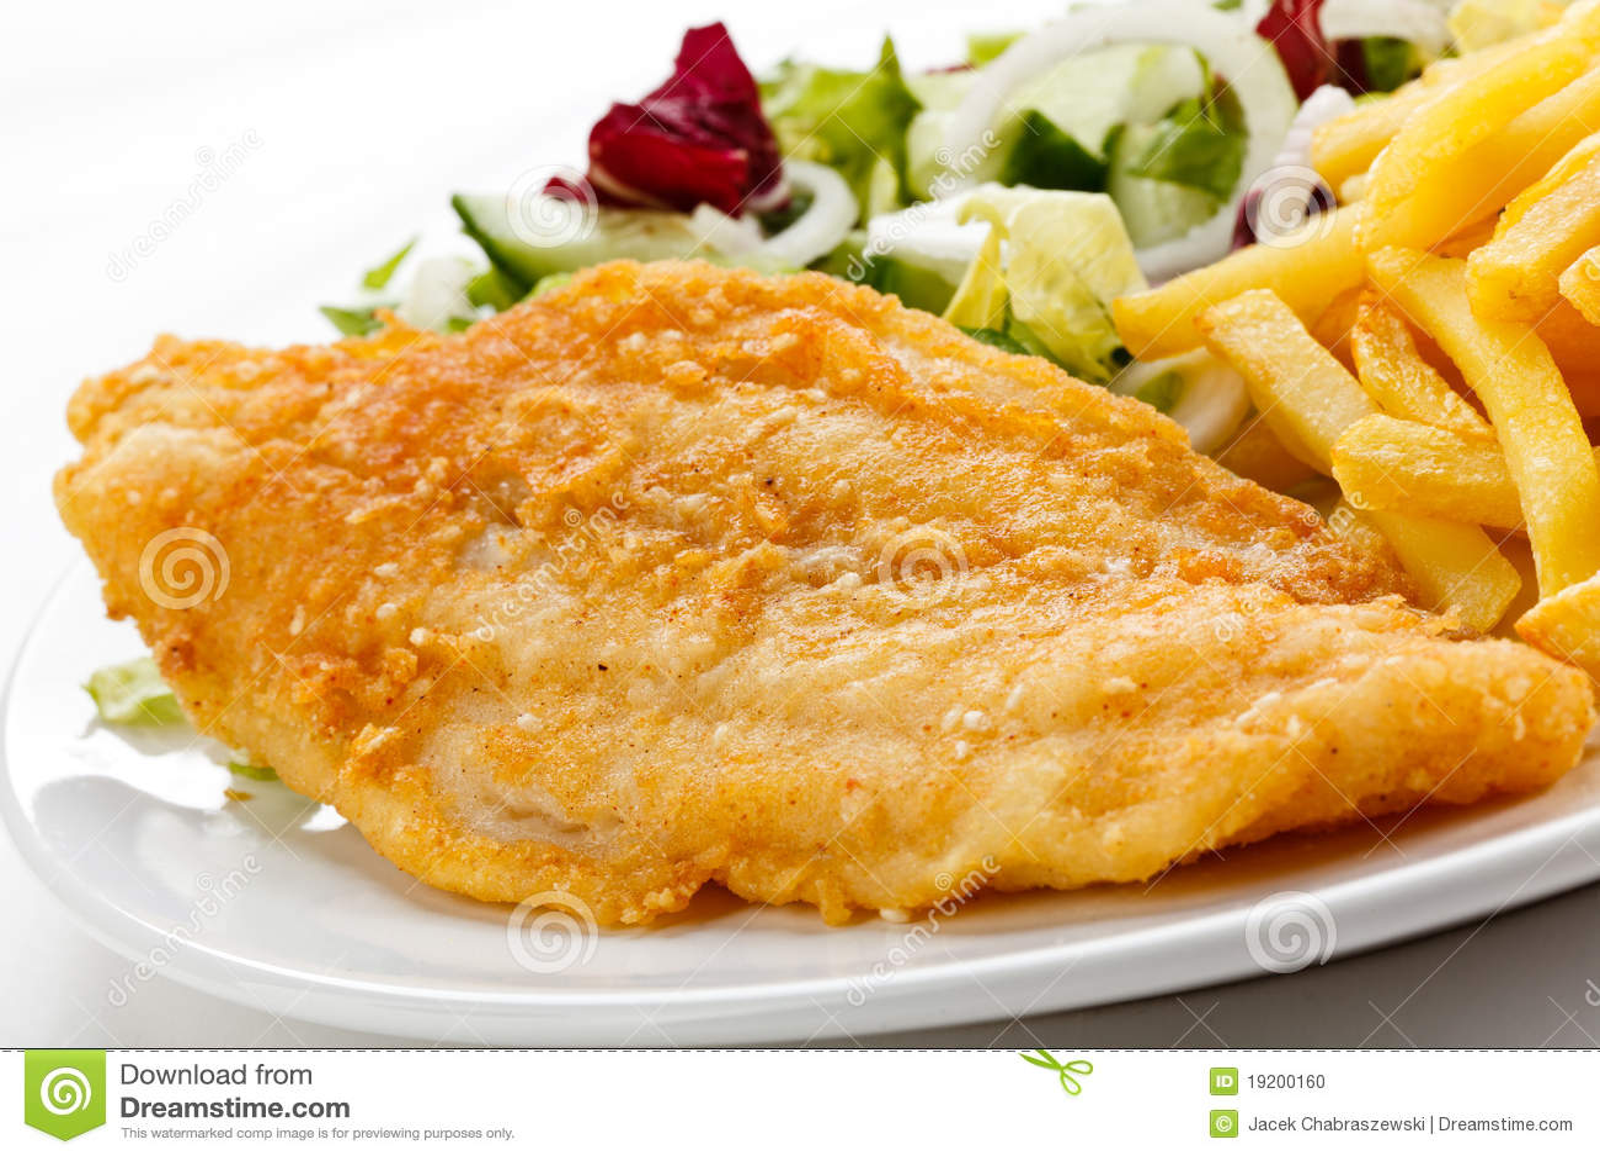 Fried fish fillet stock photo image 19200160 for Fried fish fillet